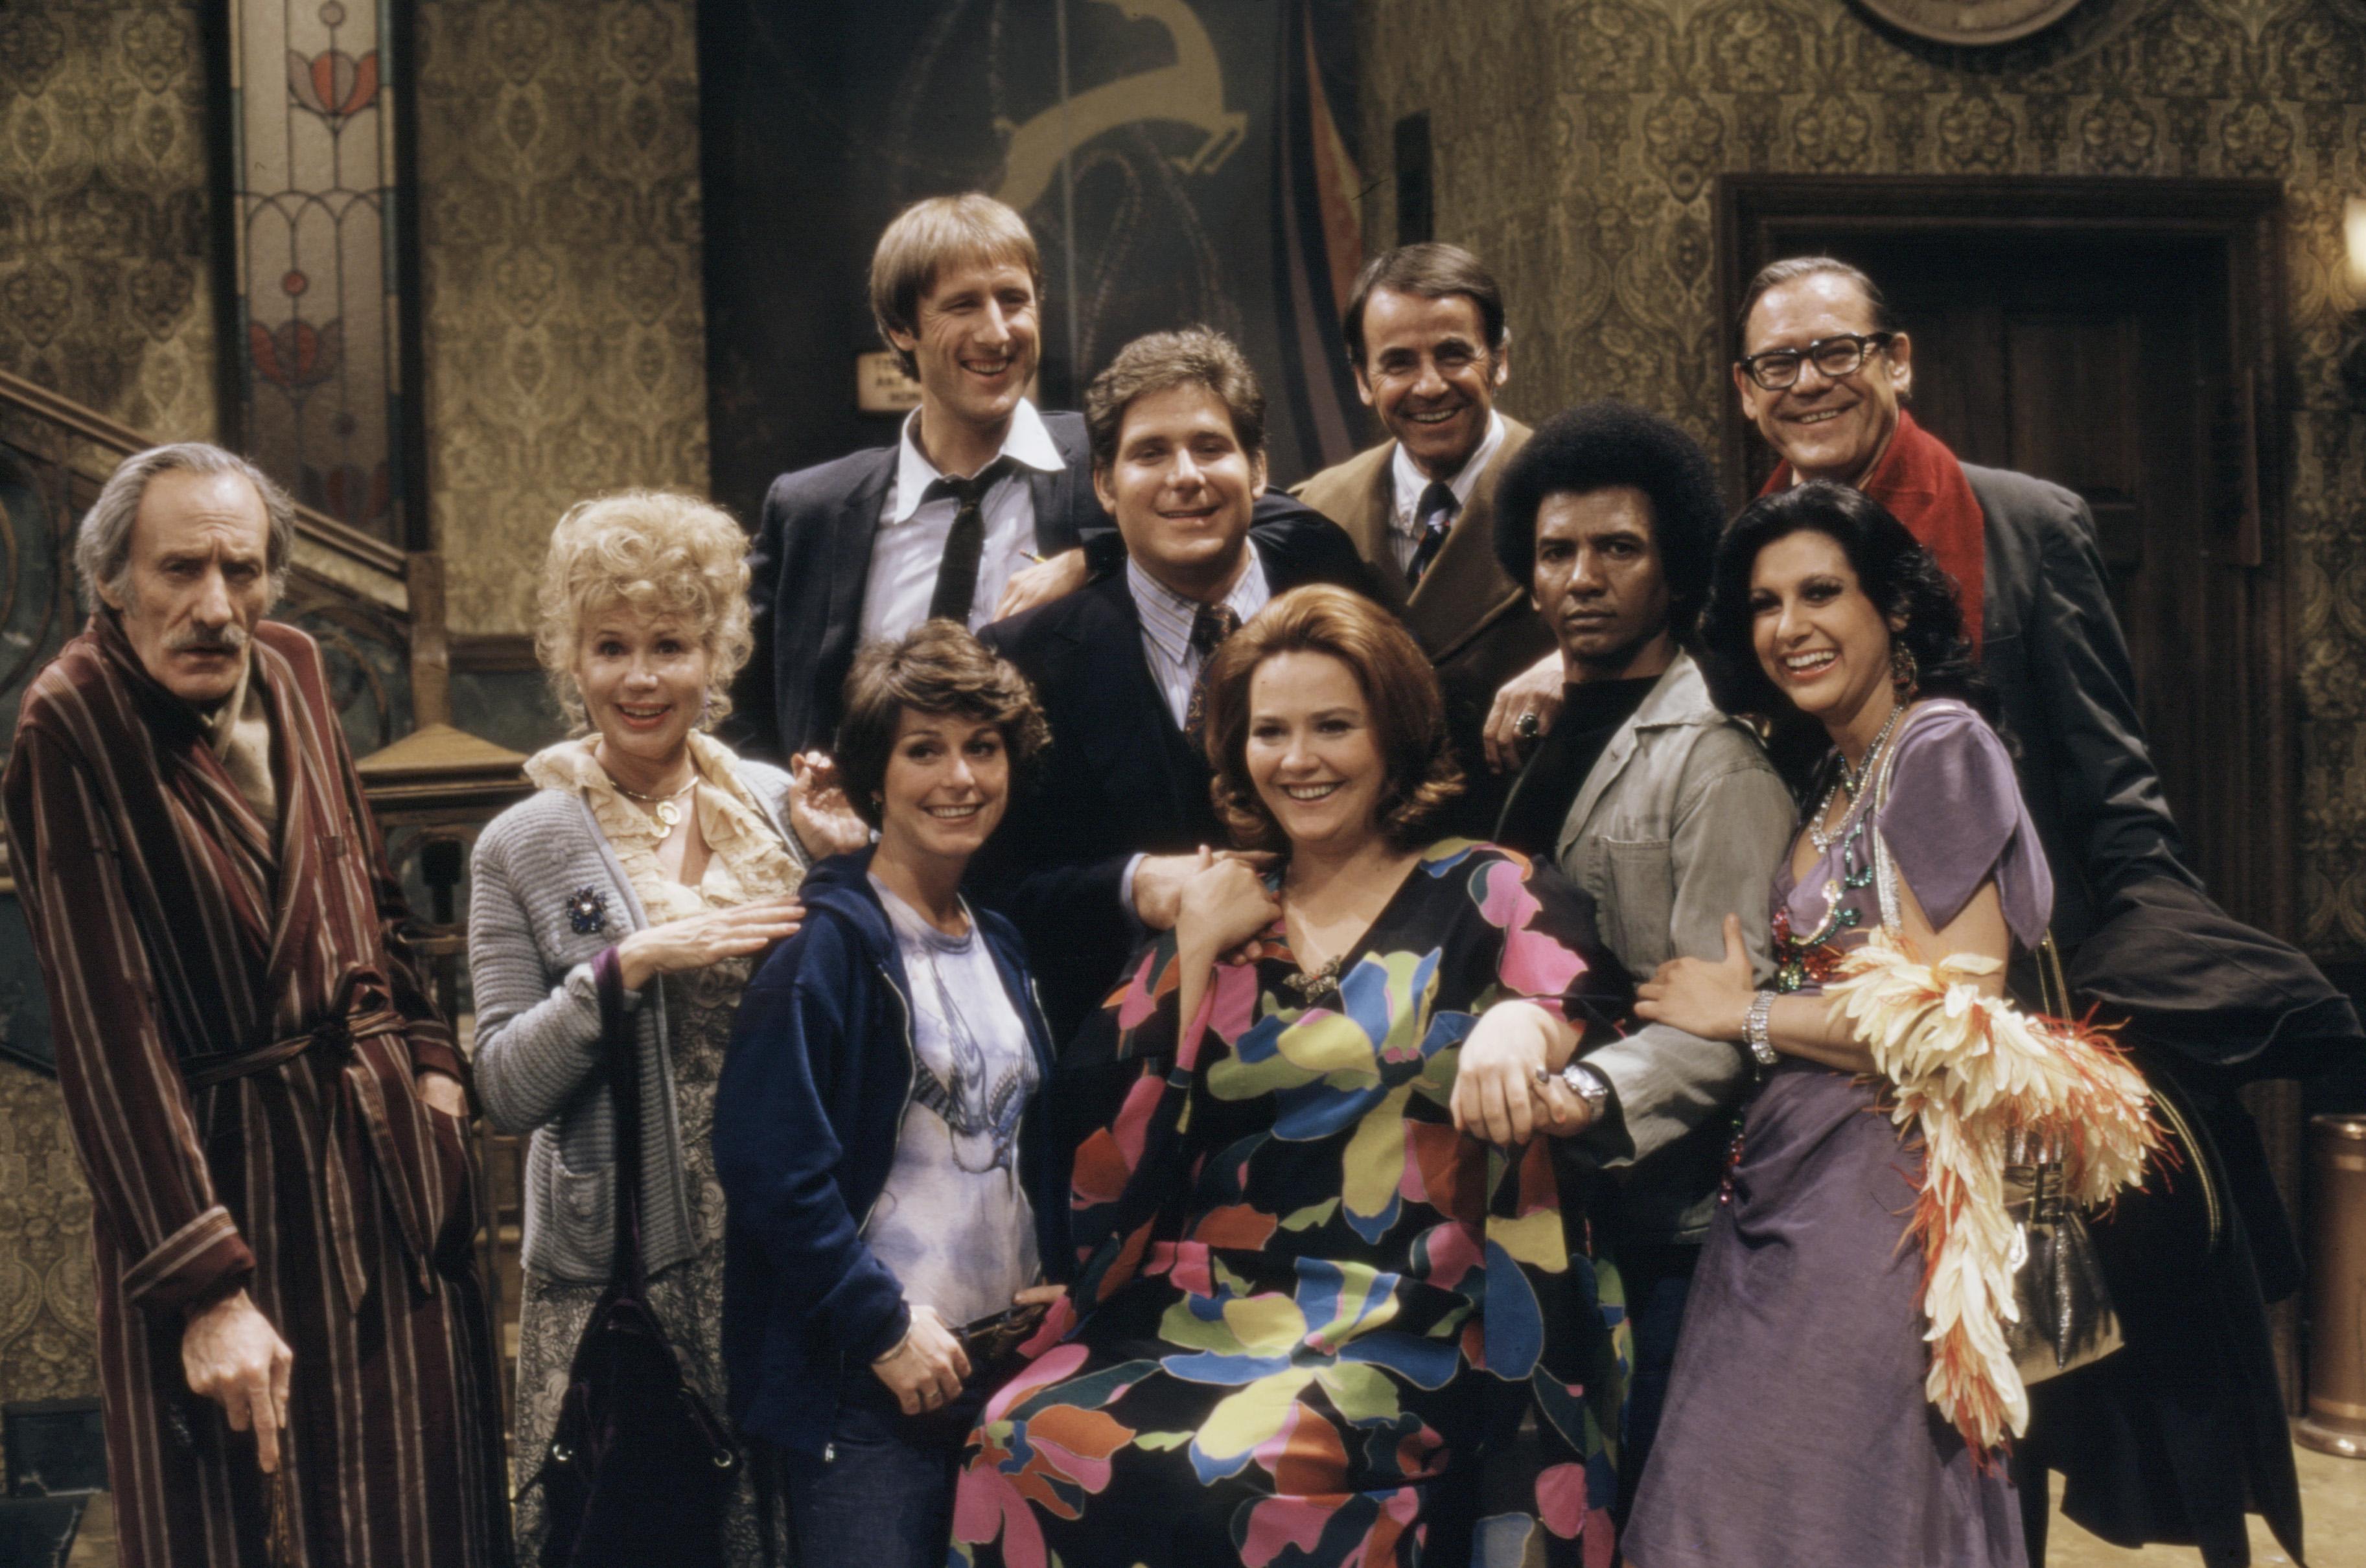 James Cromwell, Conchata Ferrell, Lee Bergere, Henry Calvert, Stan Gottlieb, Gloria LeRoy, Jeannie Linero, Richard Masur, and Robin Wilson in Hot l Baltimore (1975)